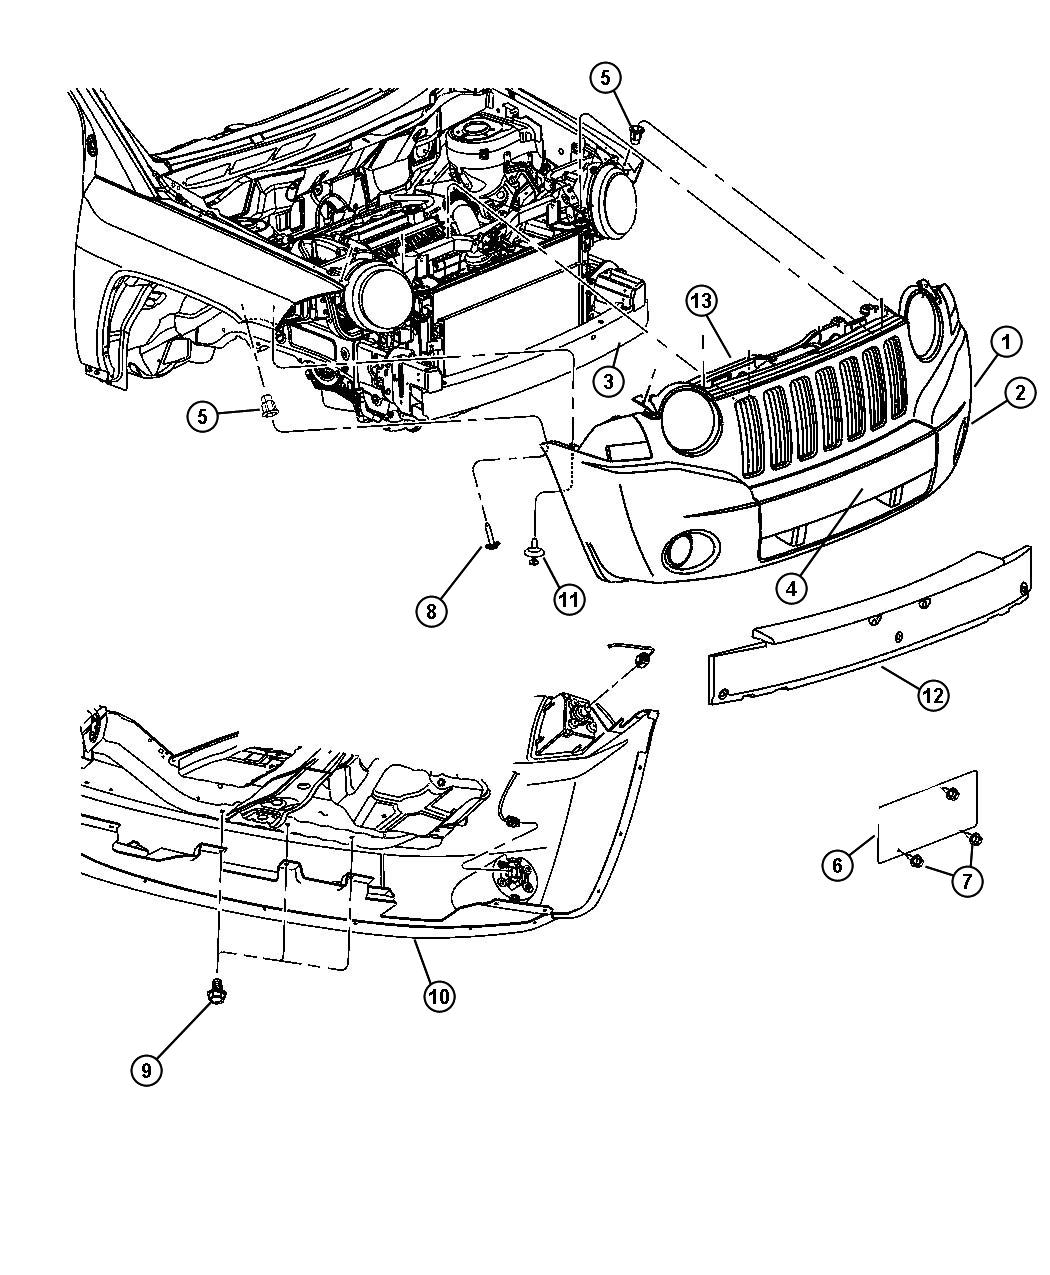 2007 jeep wrangler front suspension diagram fender hot rod deluxe wiring patriot parts bumper